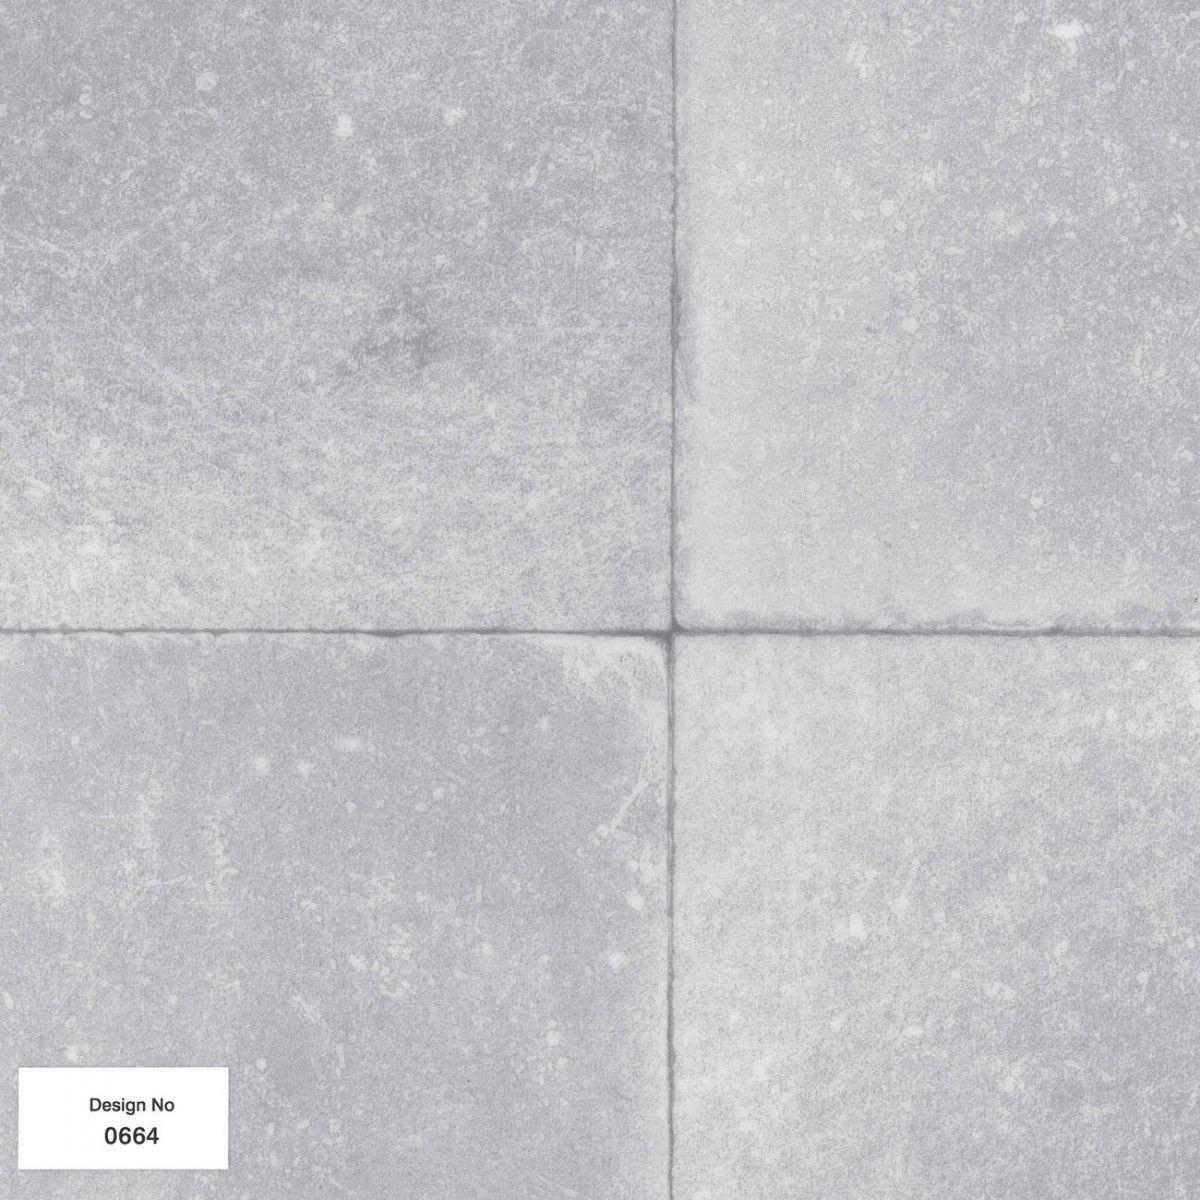 0664 Stone Effect Anti Slip Vinyl Flooring Vinyl